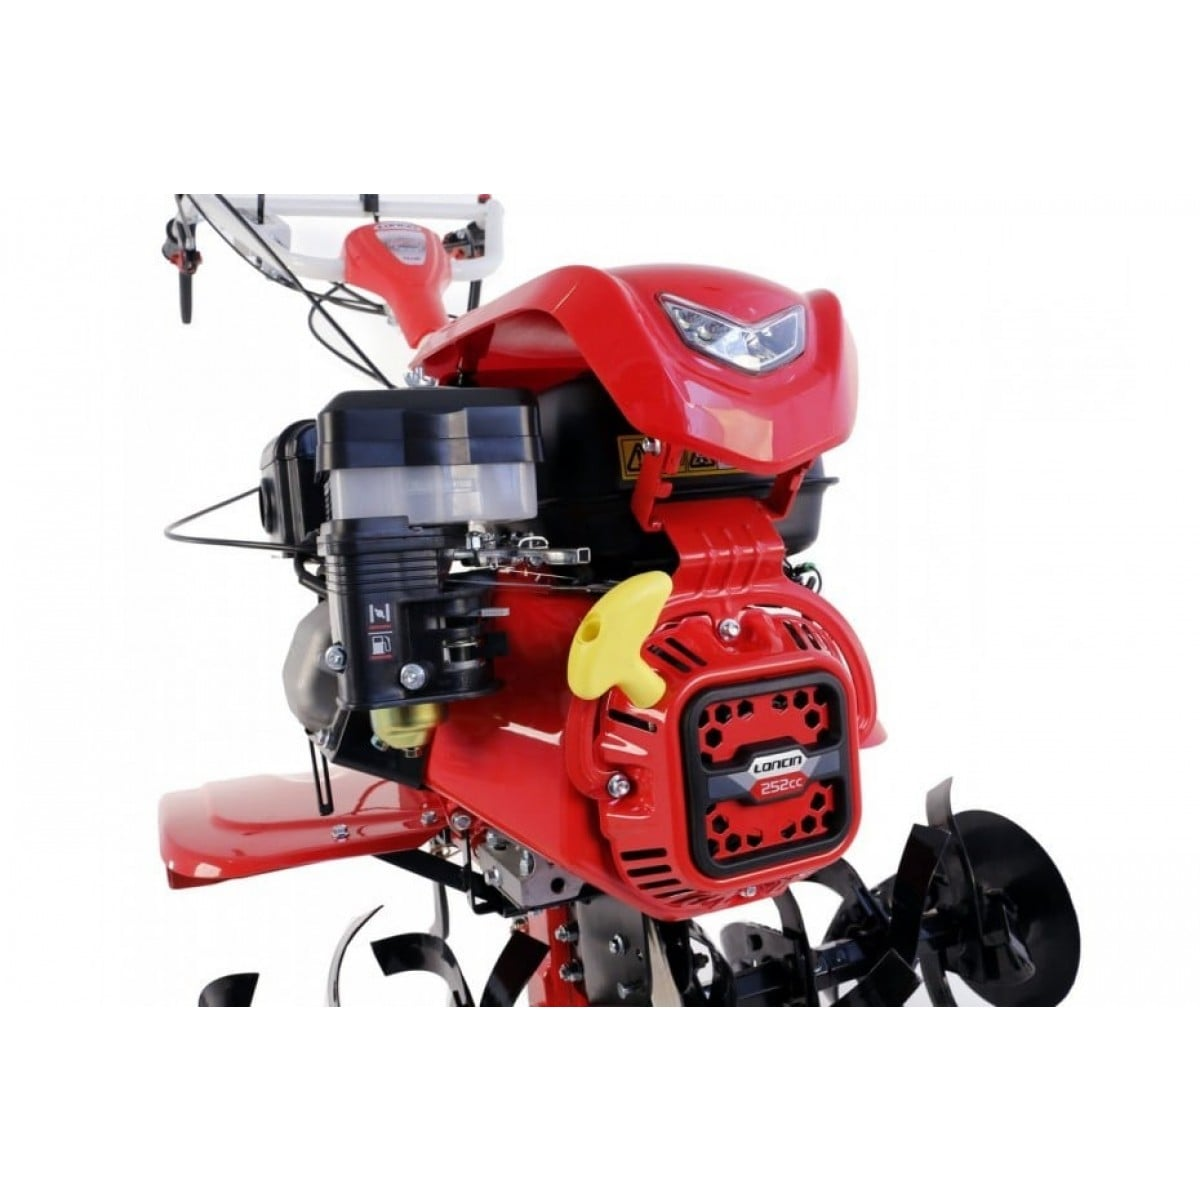 motocultor loncin lc1200 8cp o mac.ro 3 3 50